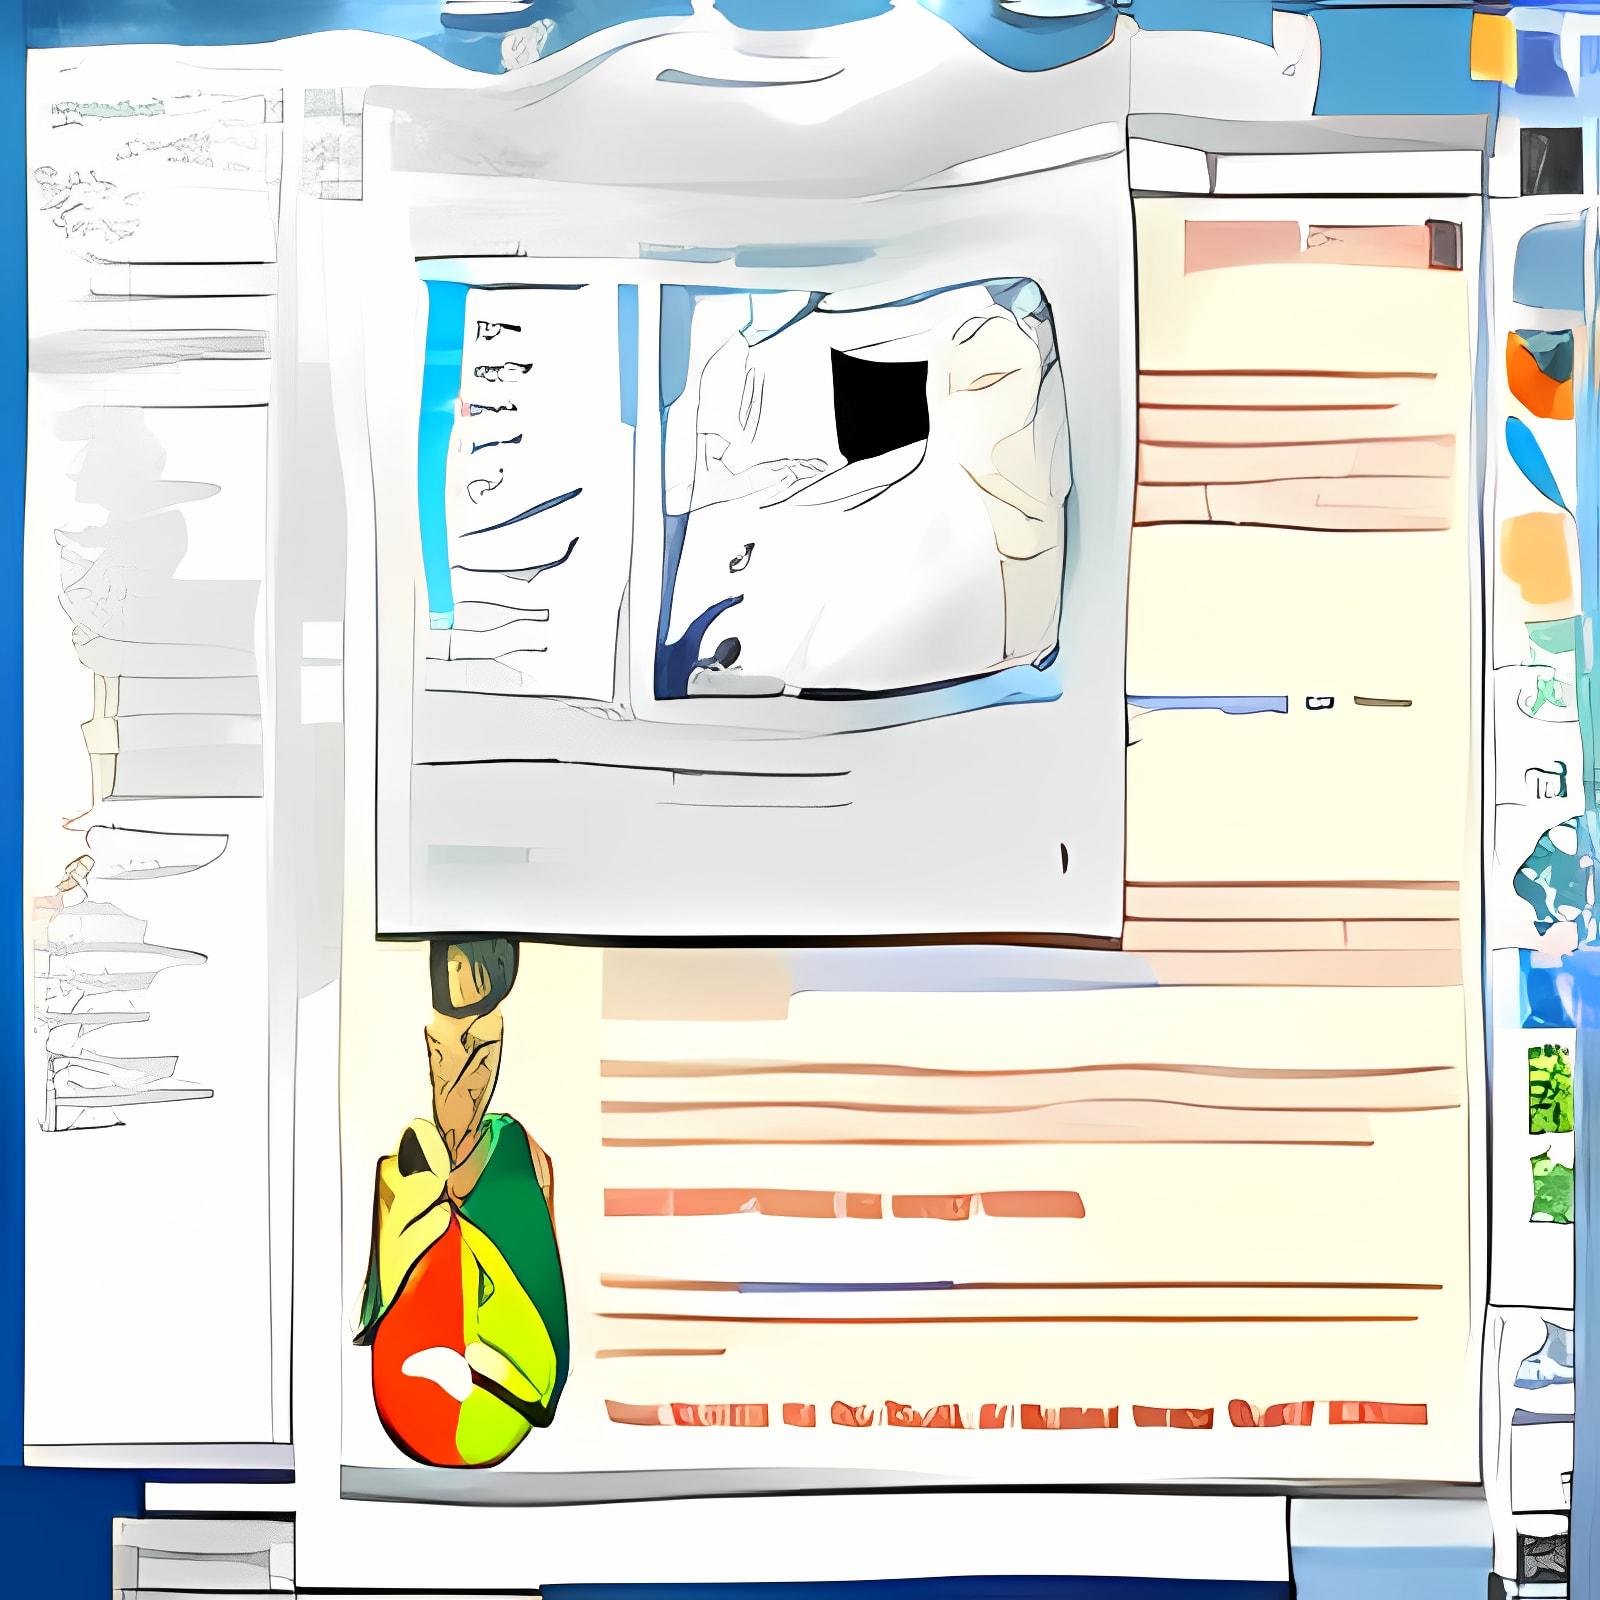 LotsaWater 1.5